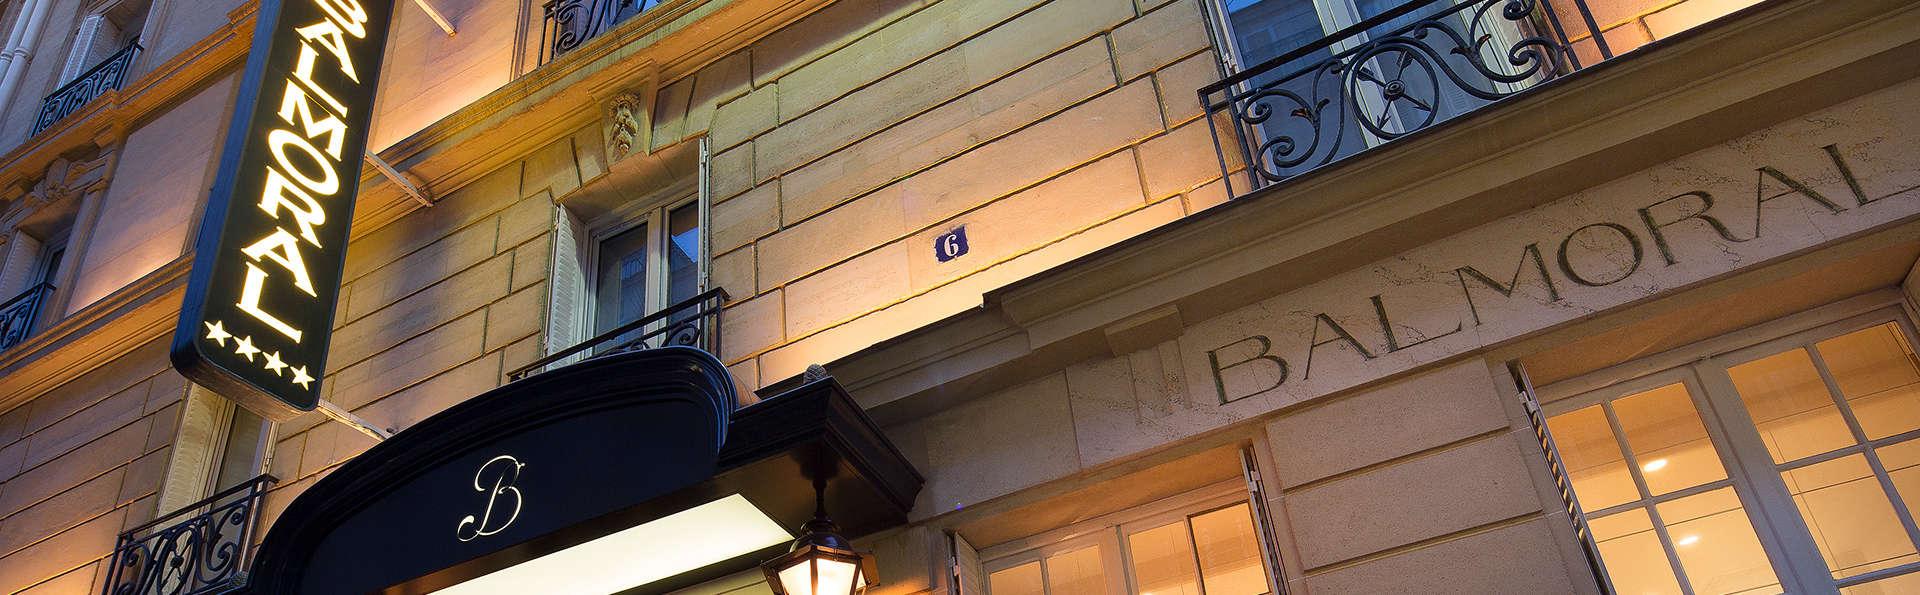 Hôtel Balmoral Champs-Elysées - EDIT_front2.jpg